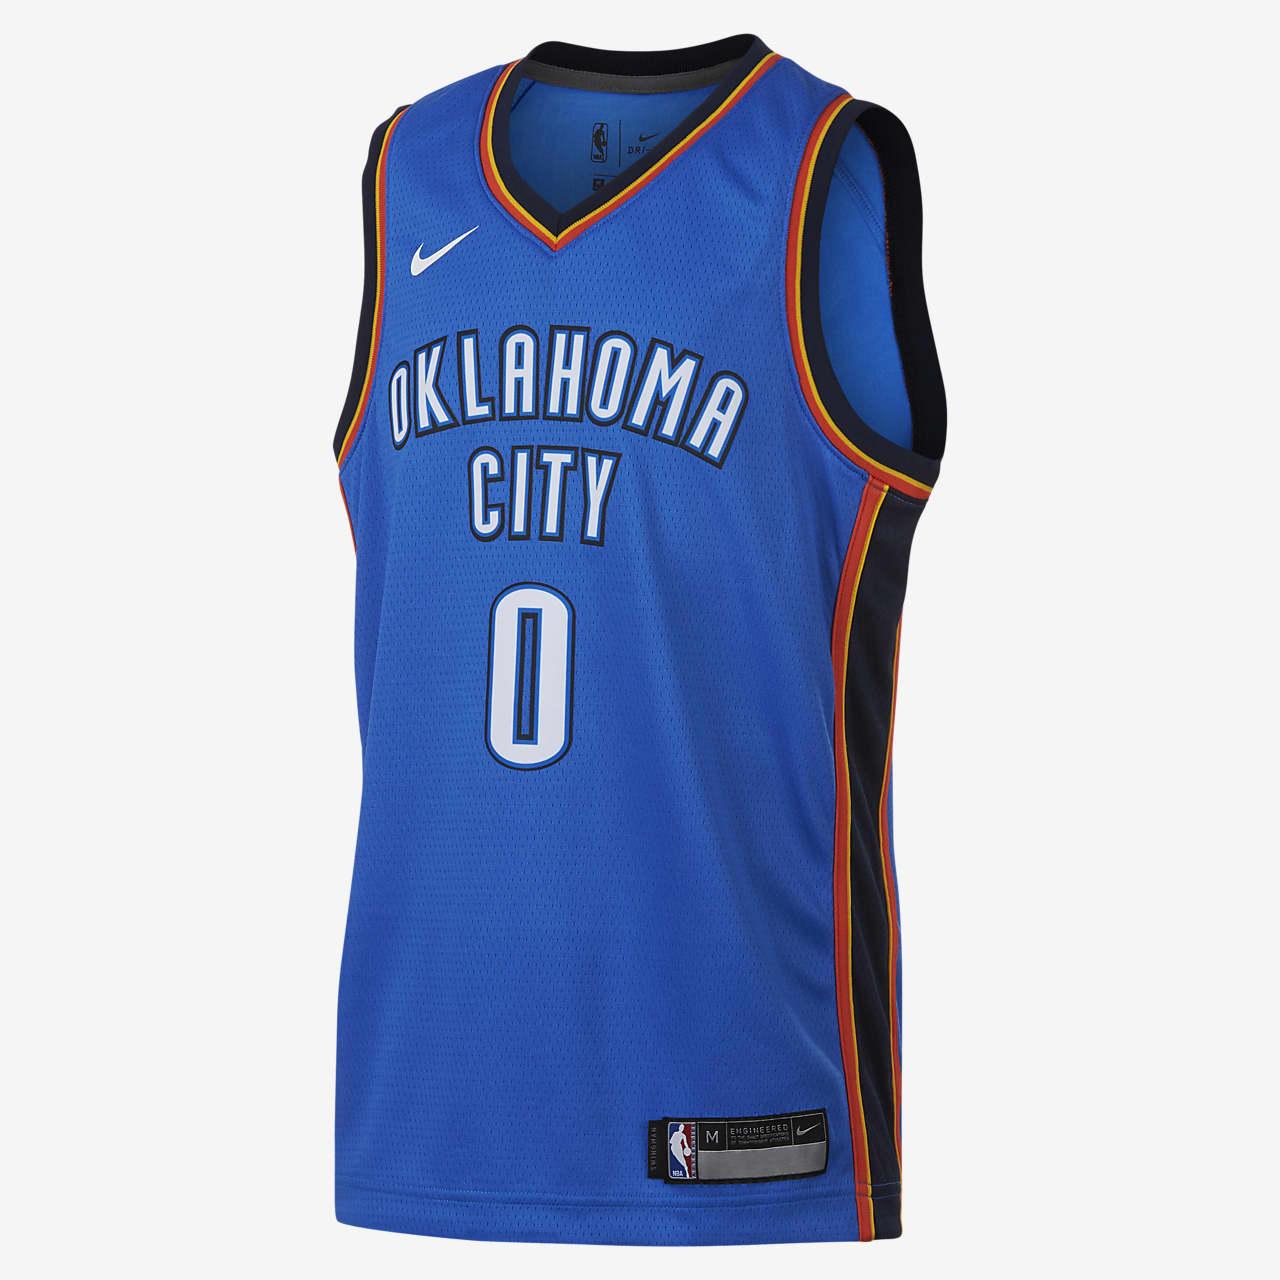 Koszulka NBA dla dużych dzieci Russell Westbrook Oklahoma City Thunder Nike Icon Edition Swingman